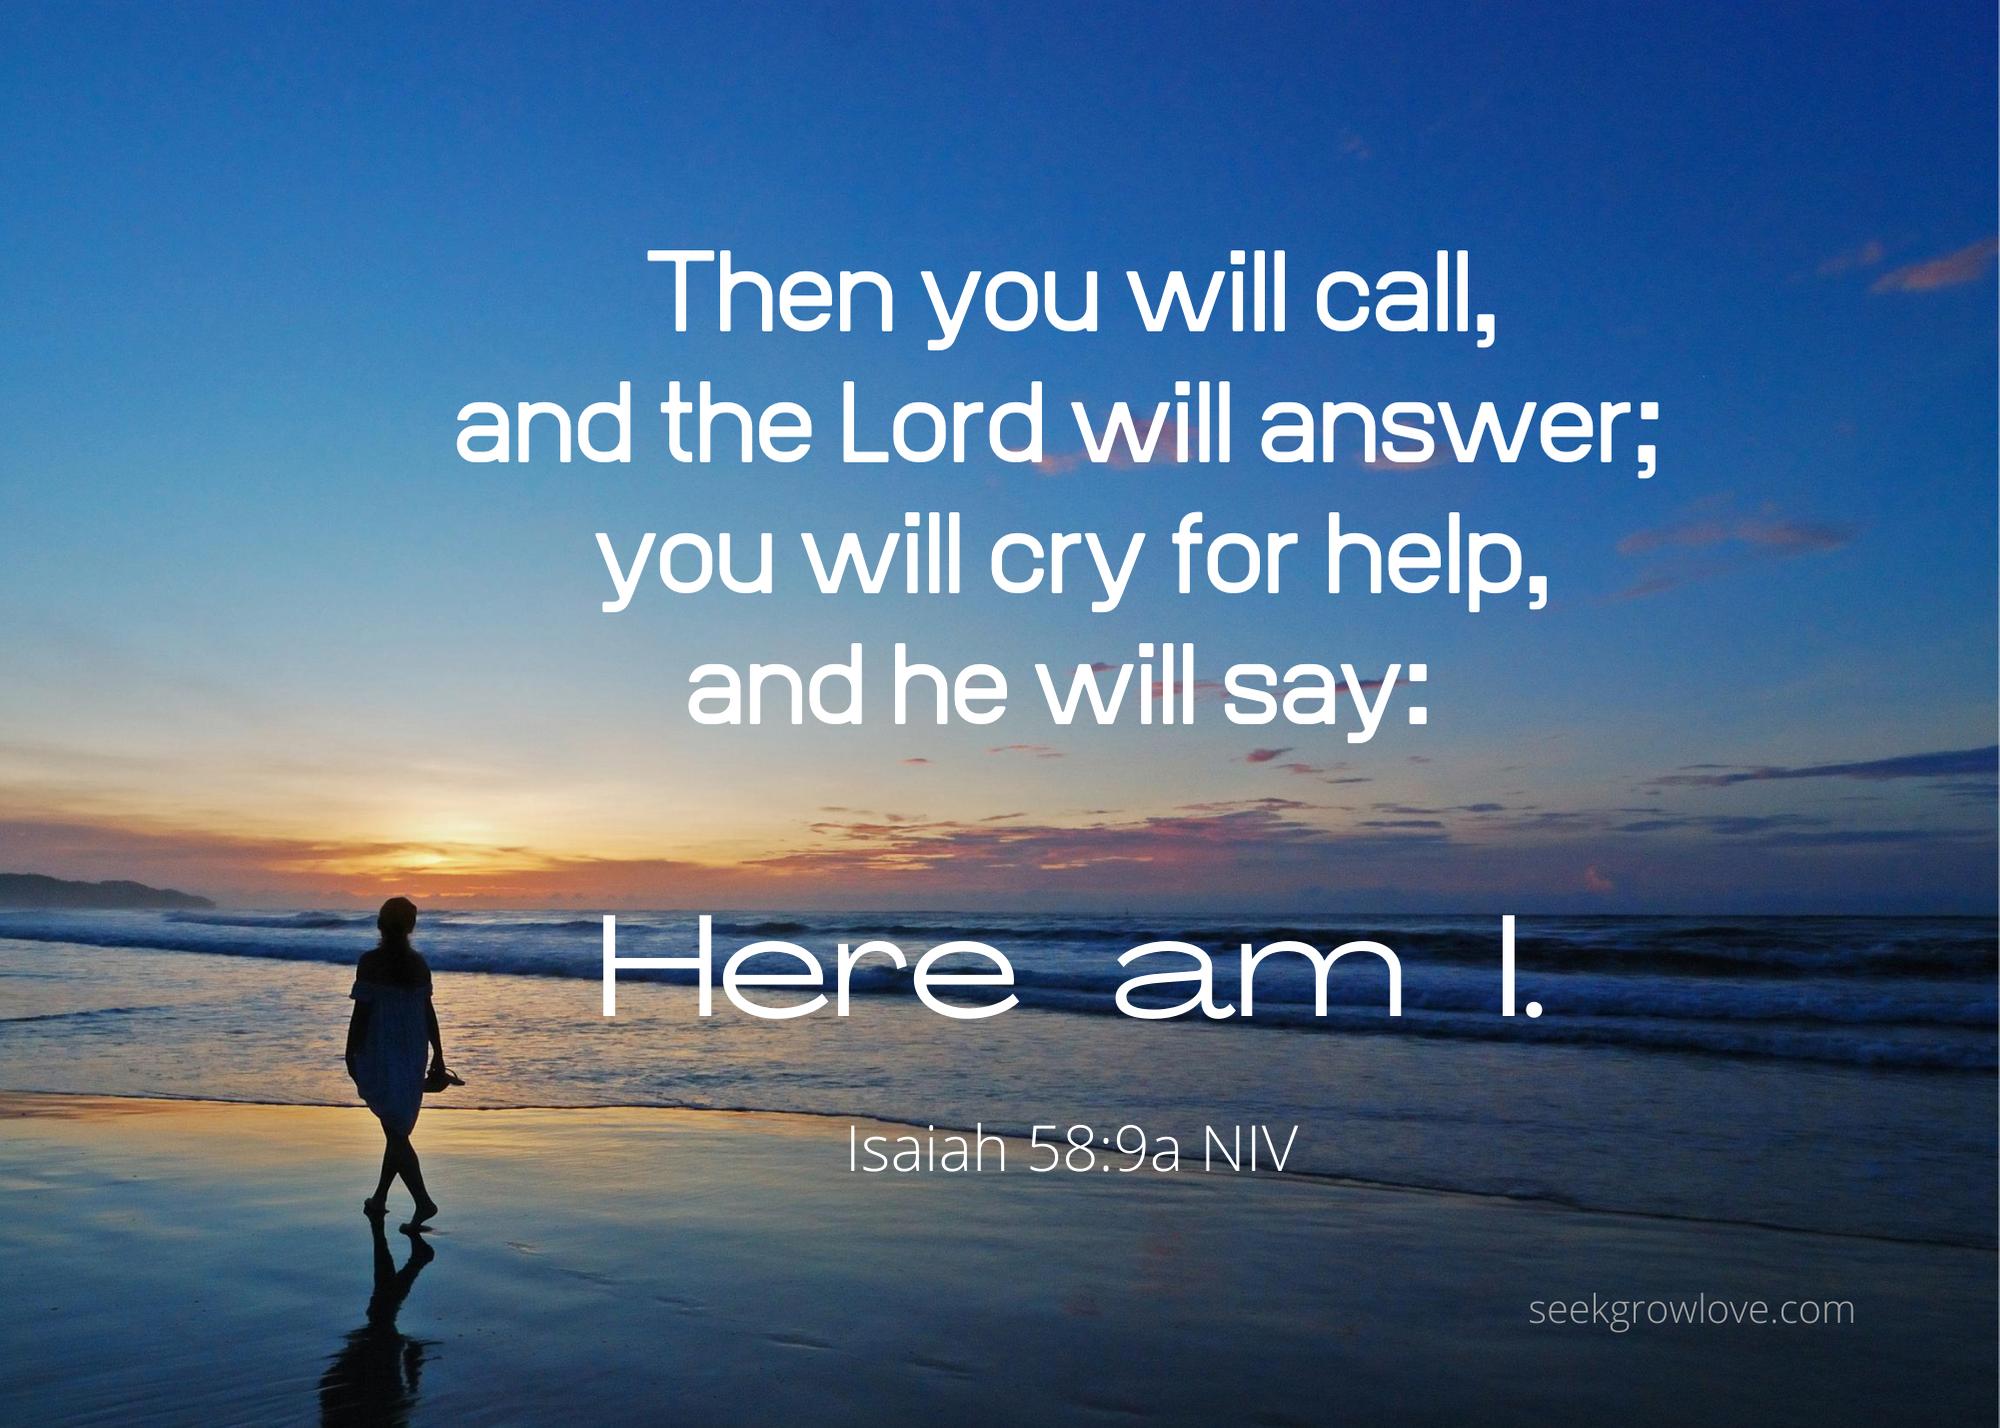 Isaiah 58 9a NIV